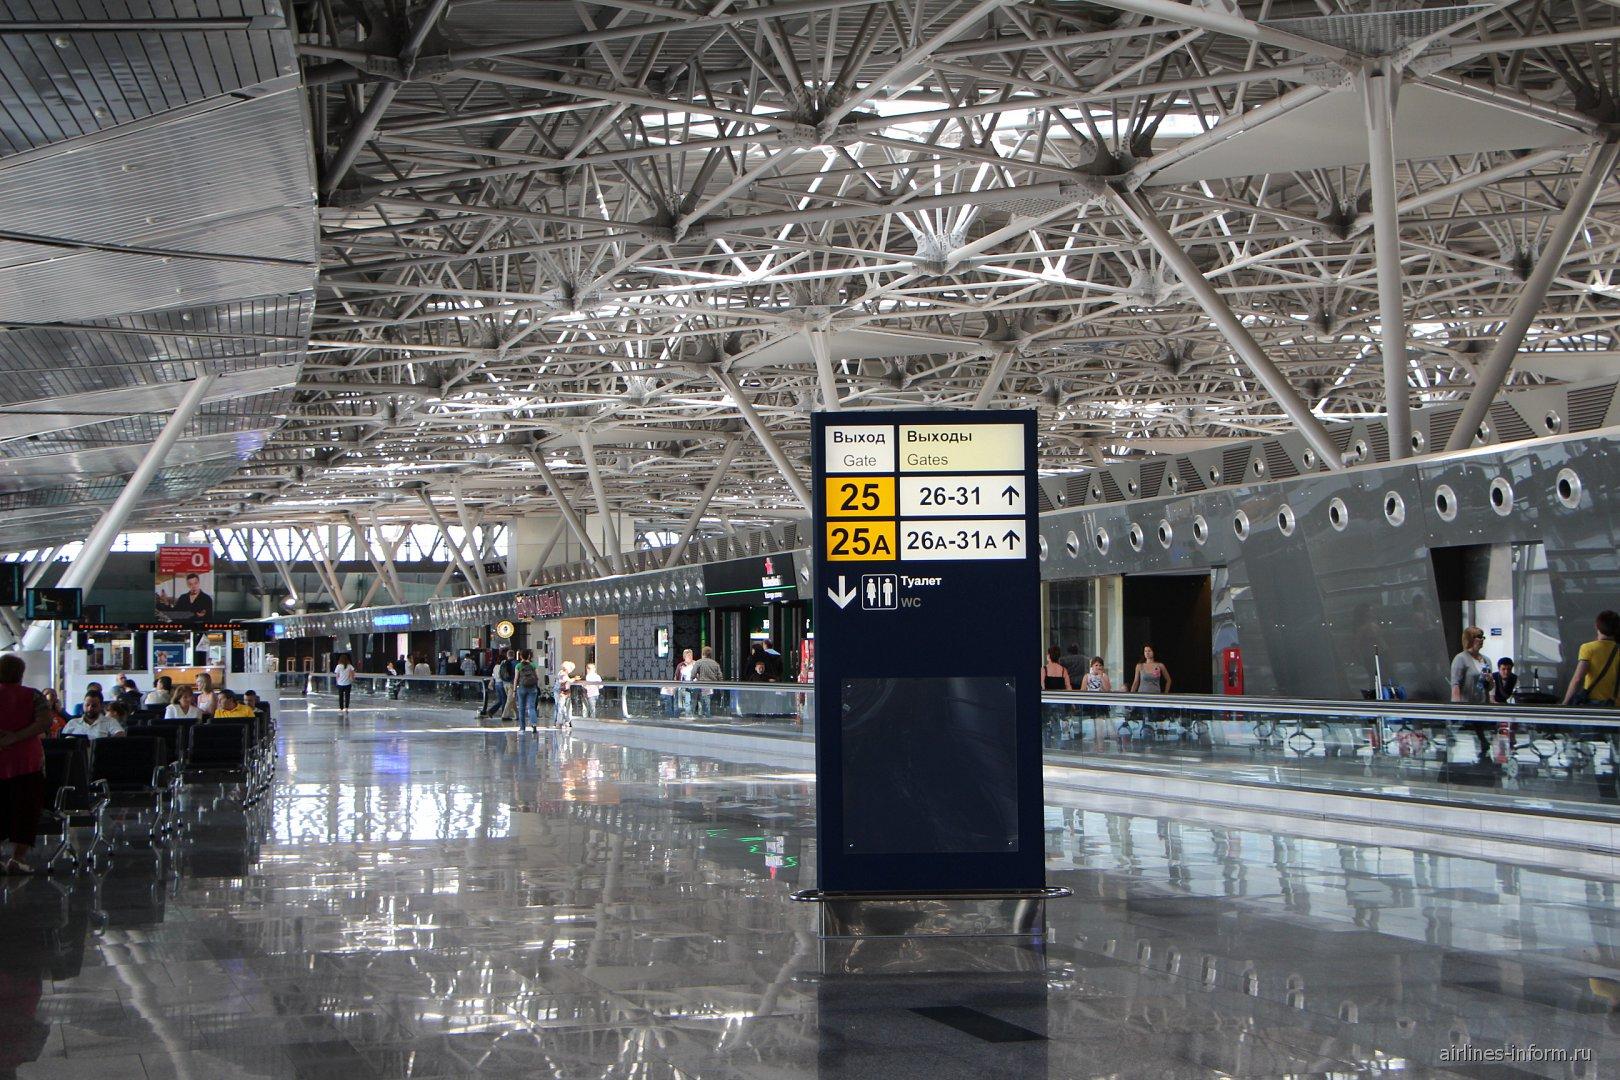 Чистая зона в аэропорту Внуково